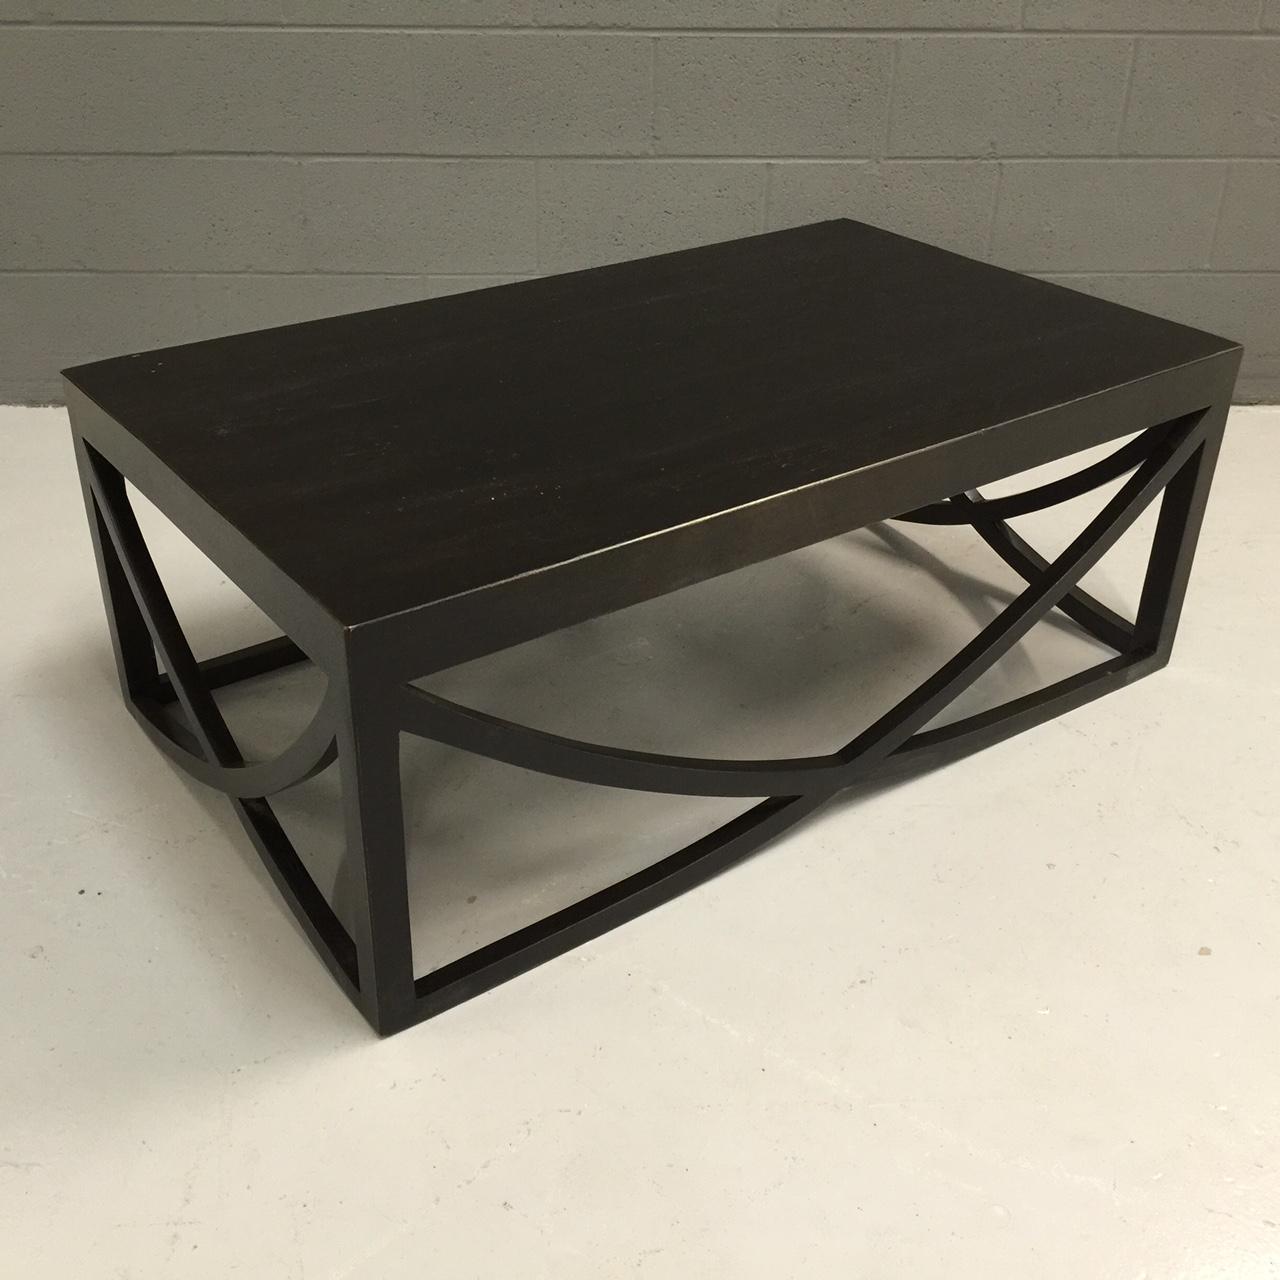 399 sofa store on thompson lane stores toronto u shape cross coffee table nadeau nashville